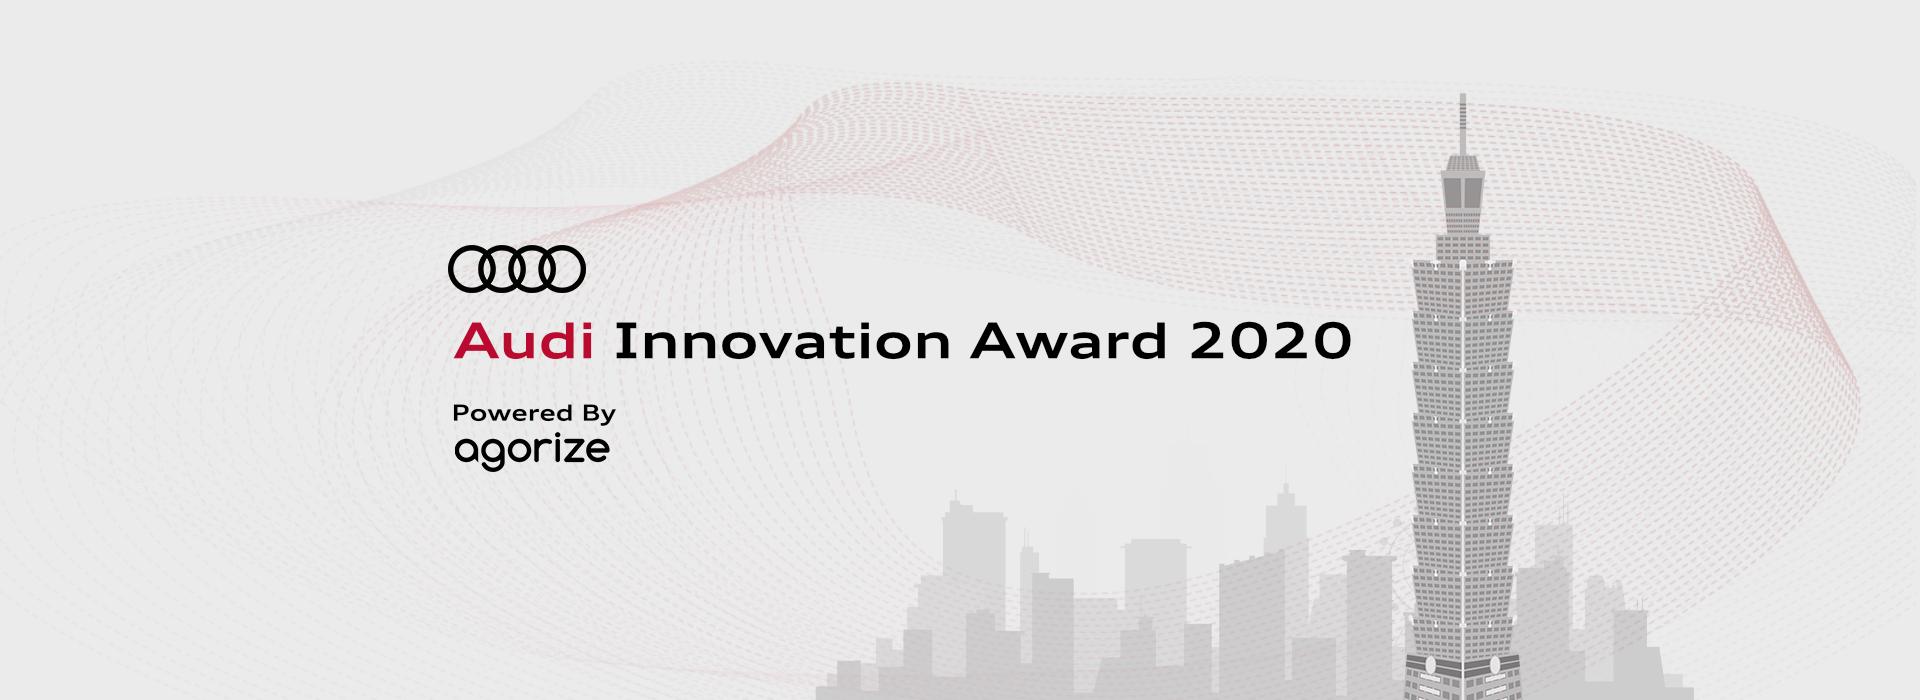 [FINAL CALL] Audi Innovation Award 2020